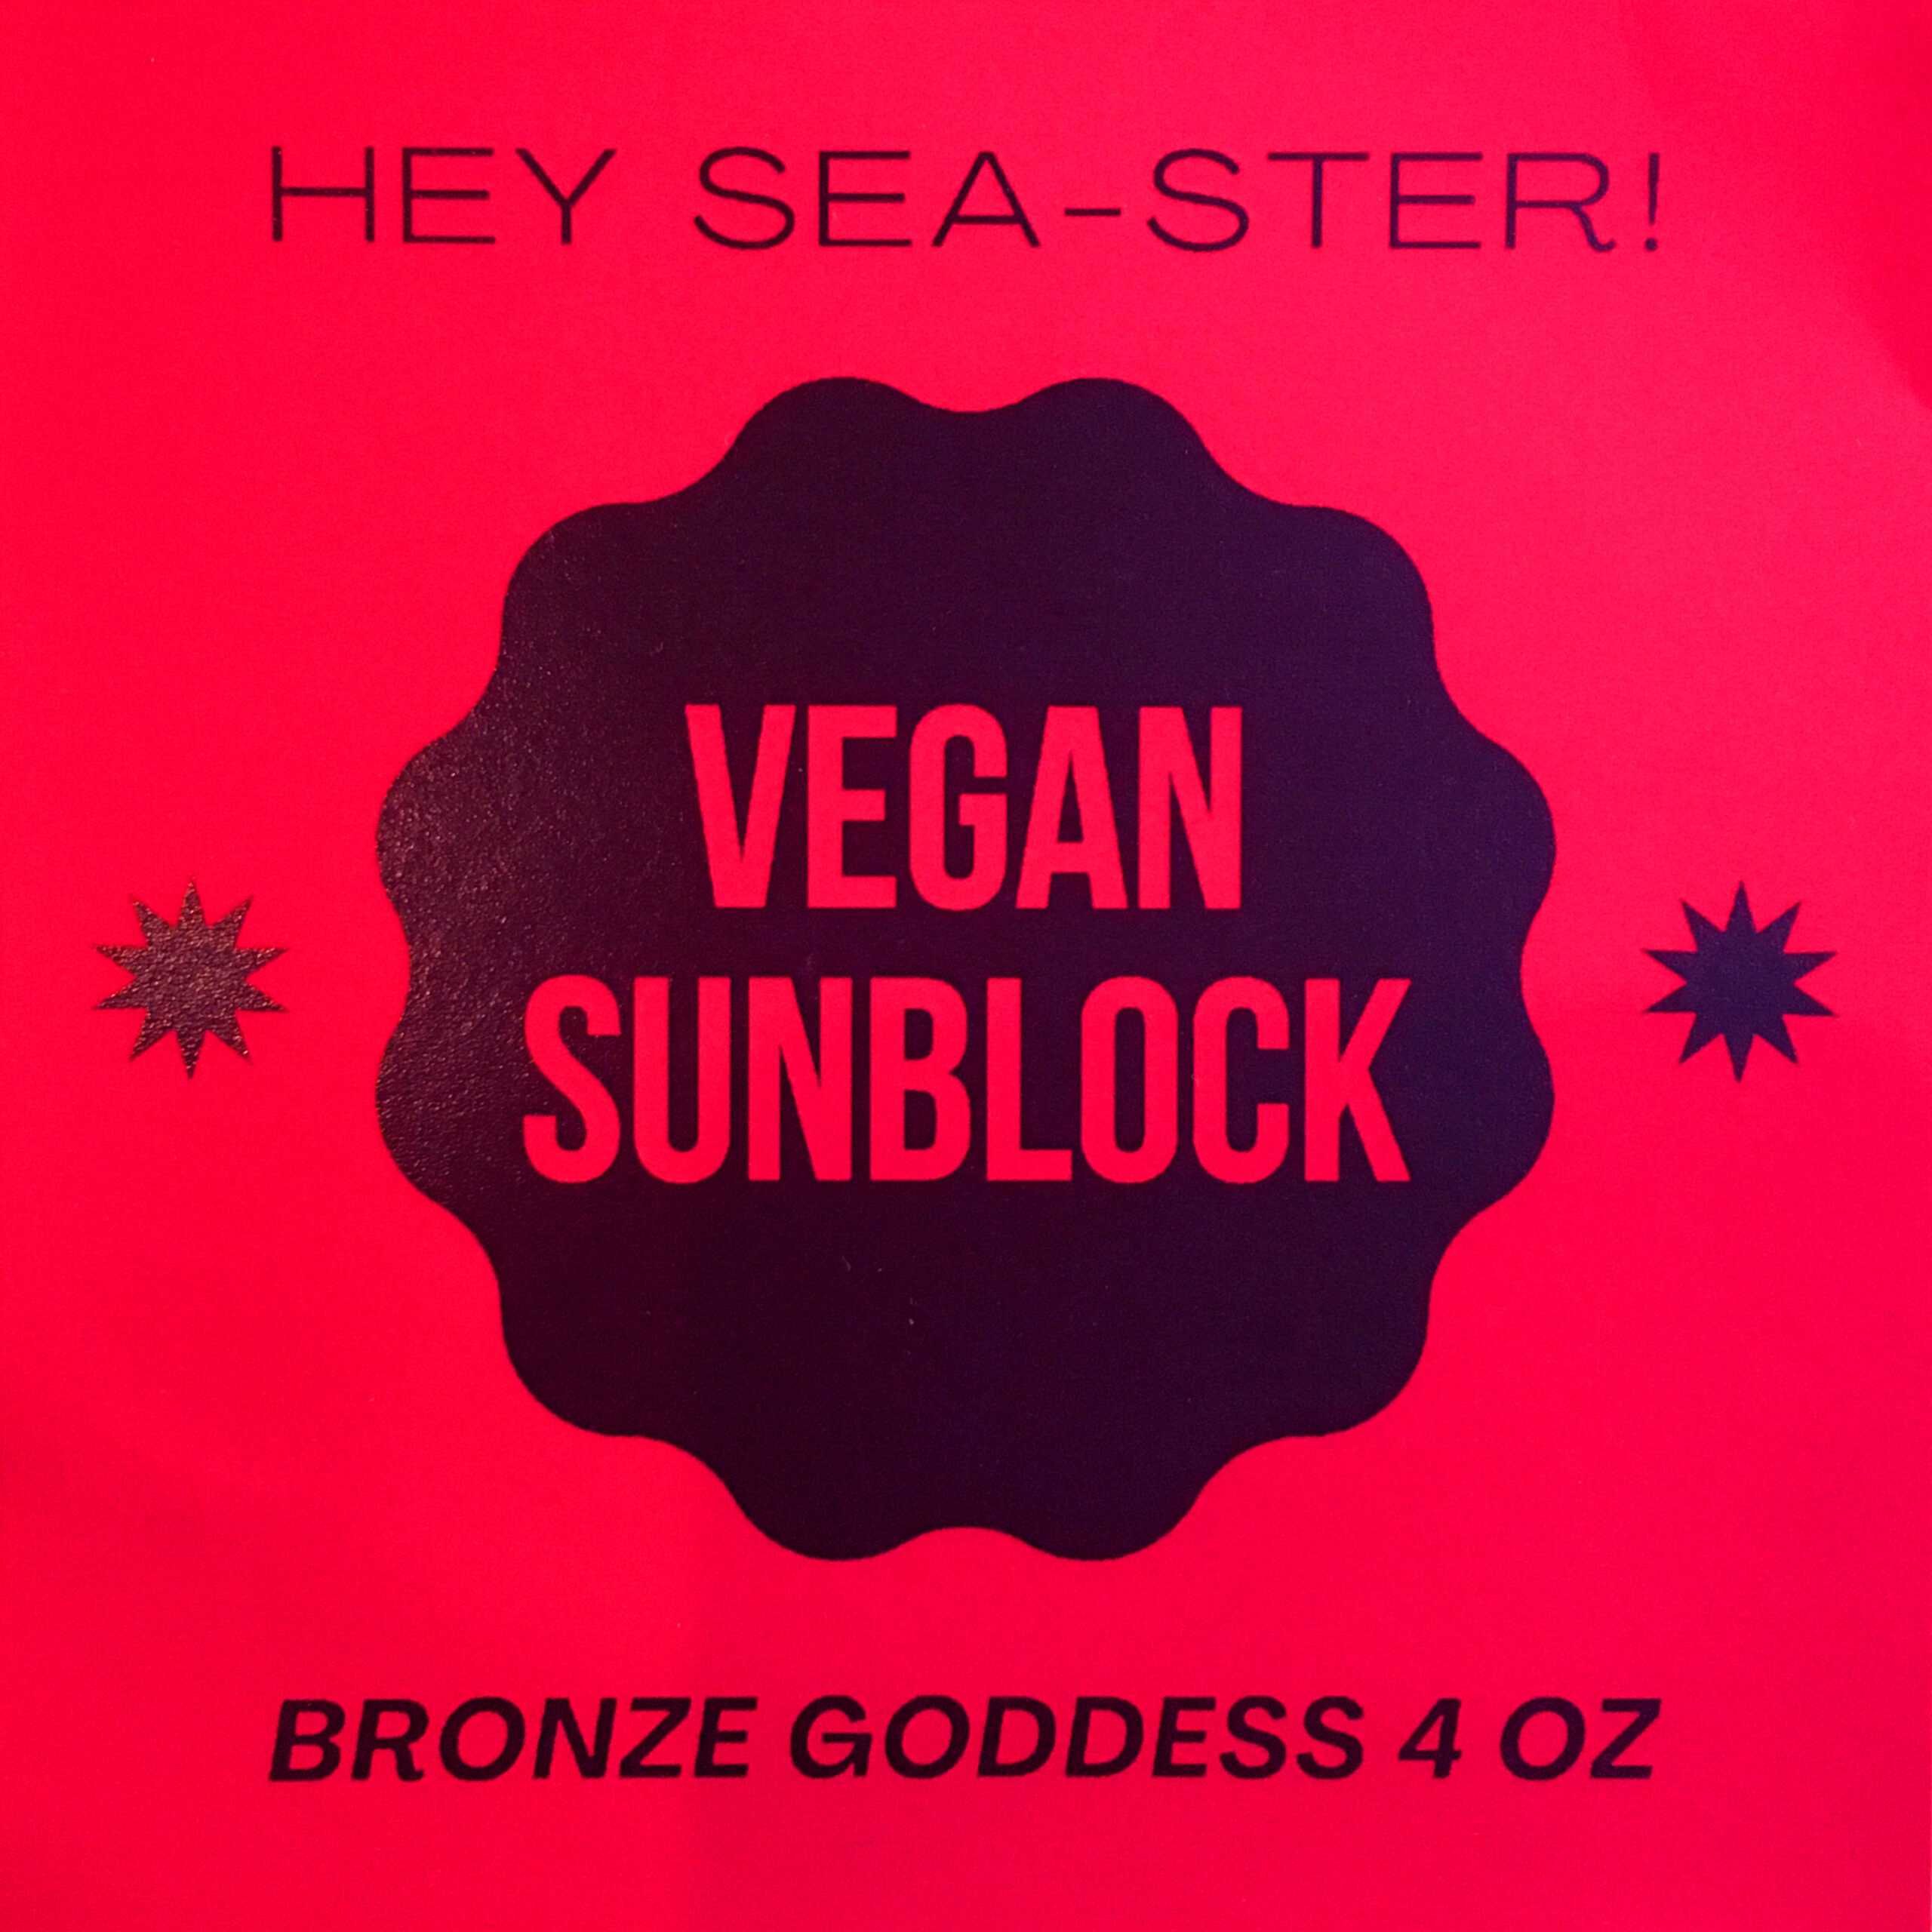 vegan sunblock